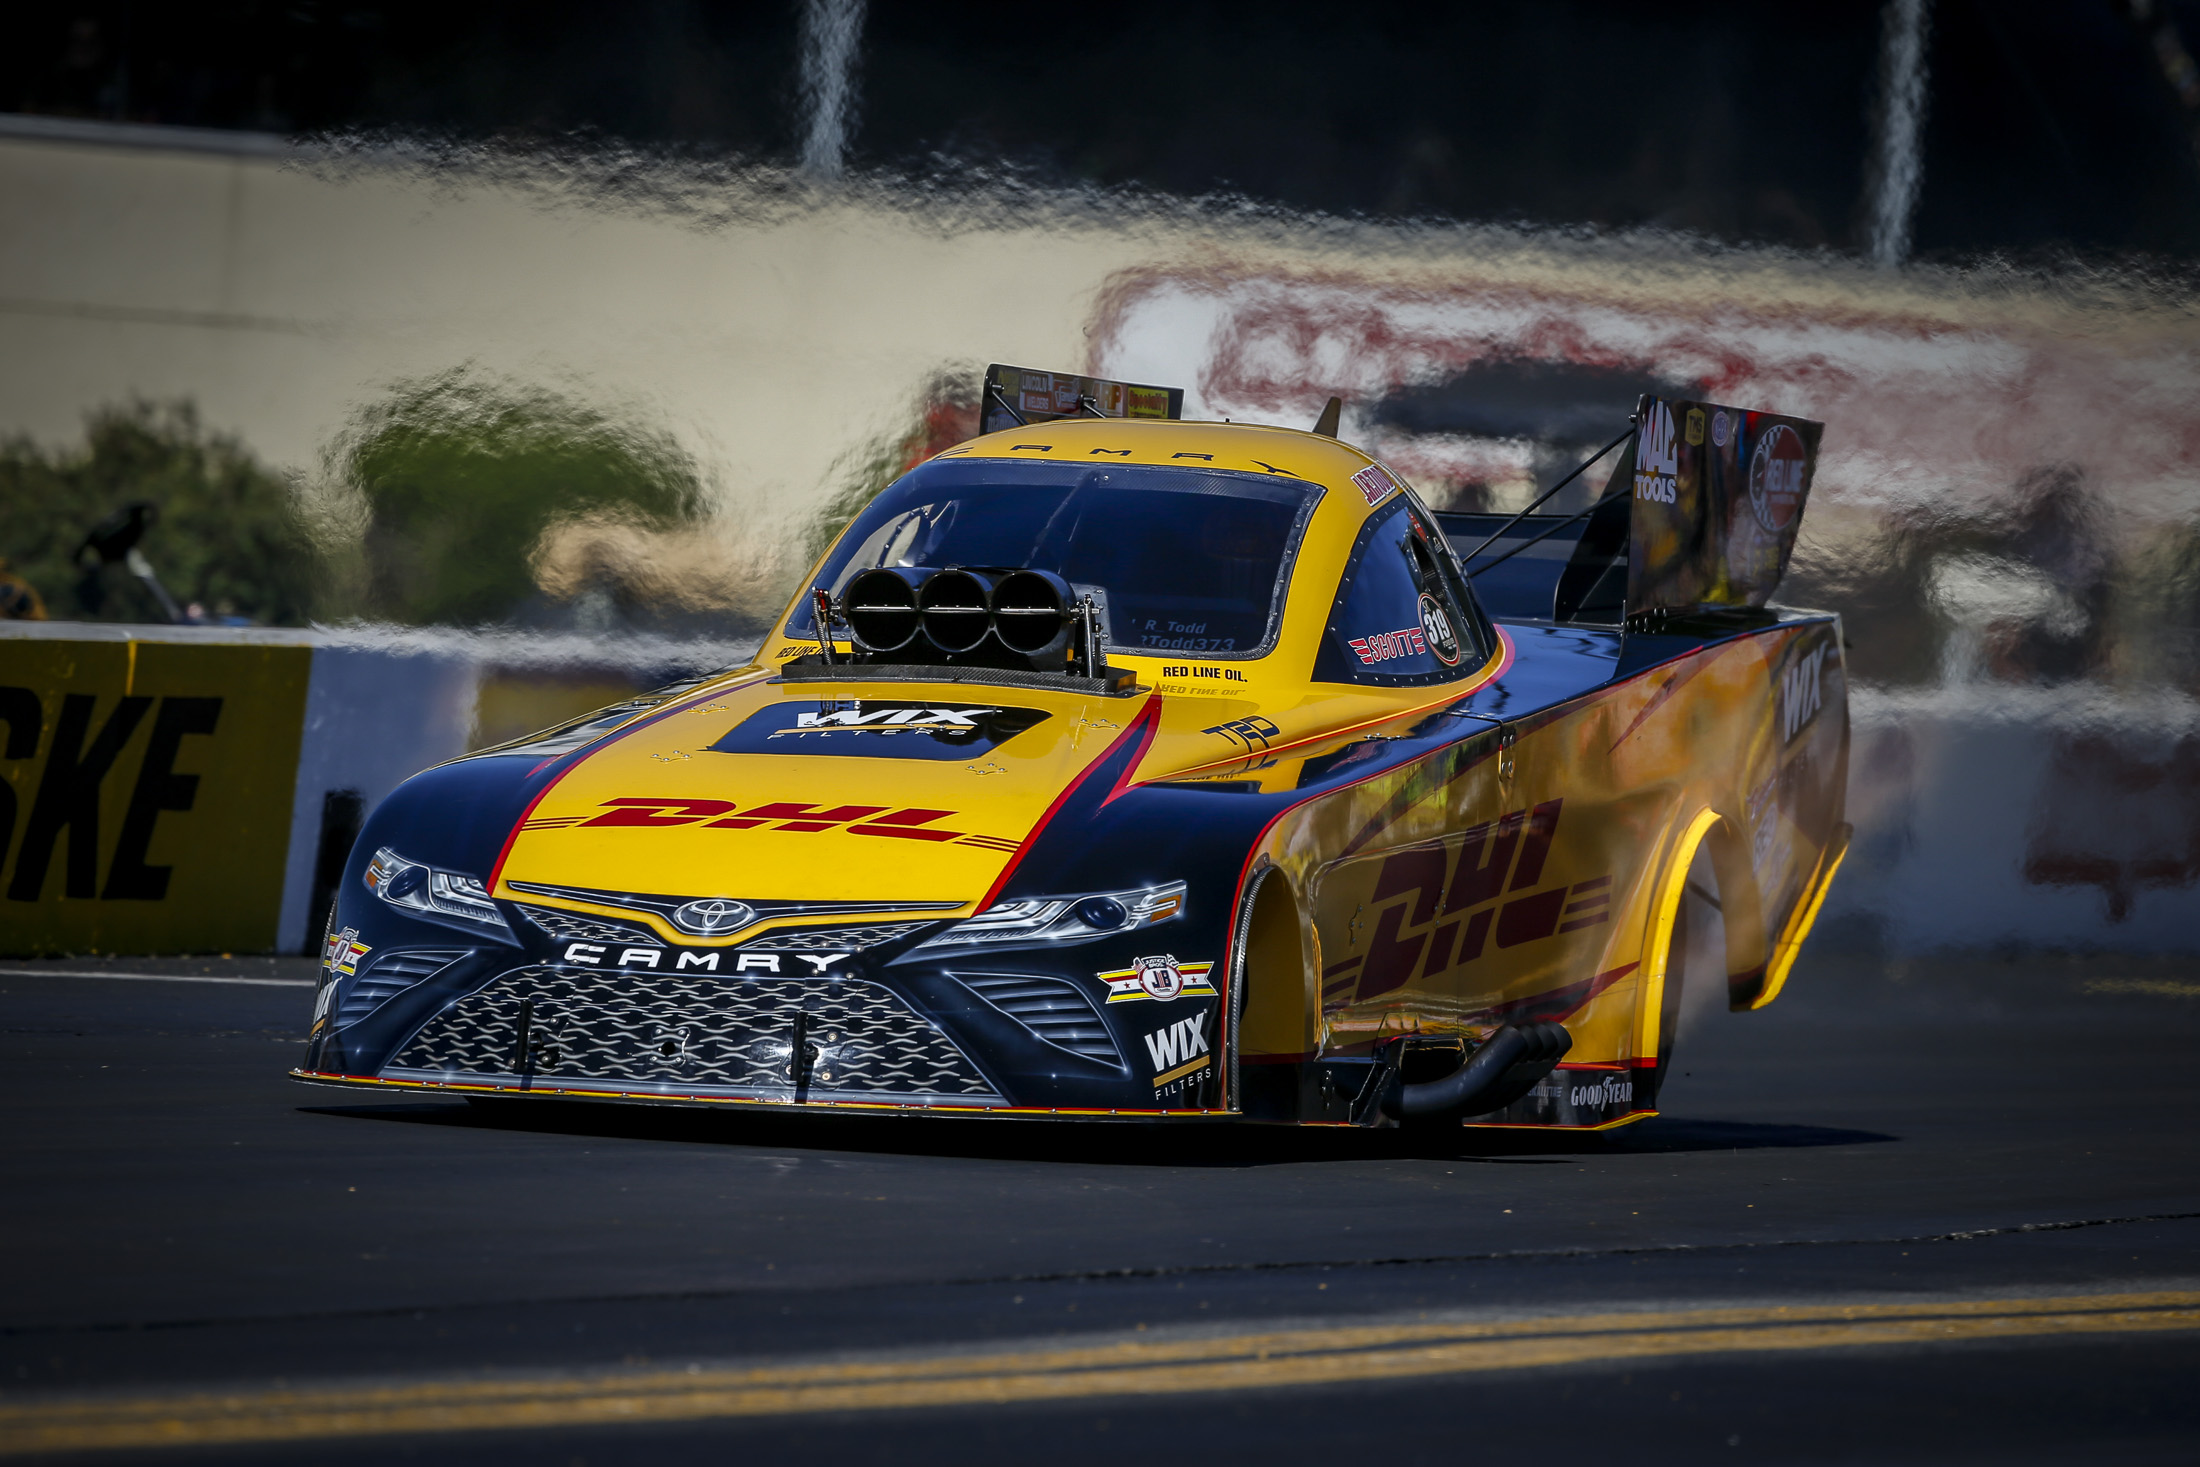 DHL Funny Car pilot J.R. Todd racing on Sunday at the Dodge NHRA Nationals